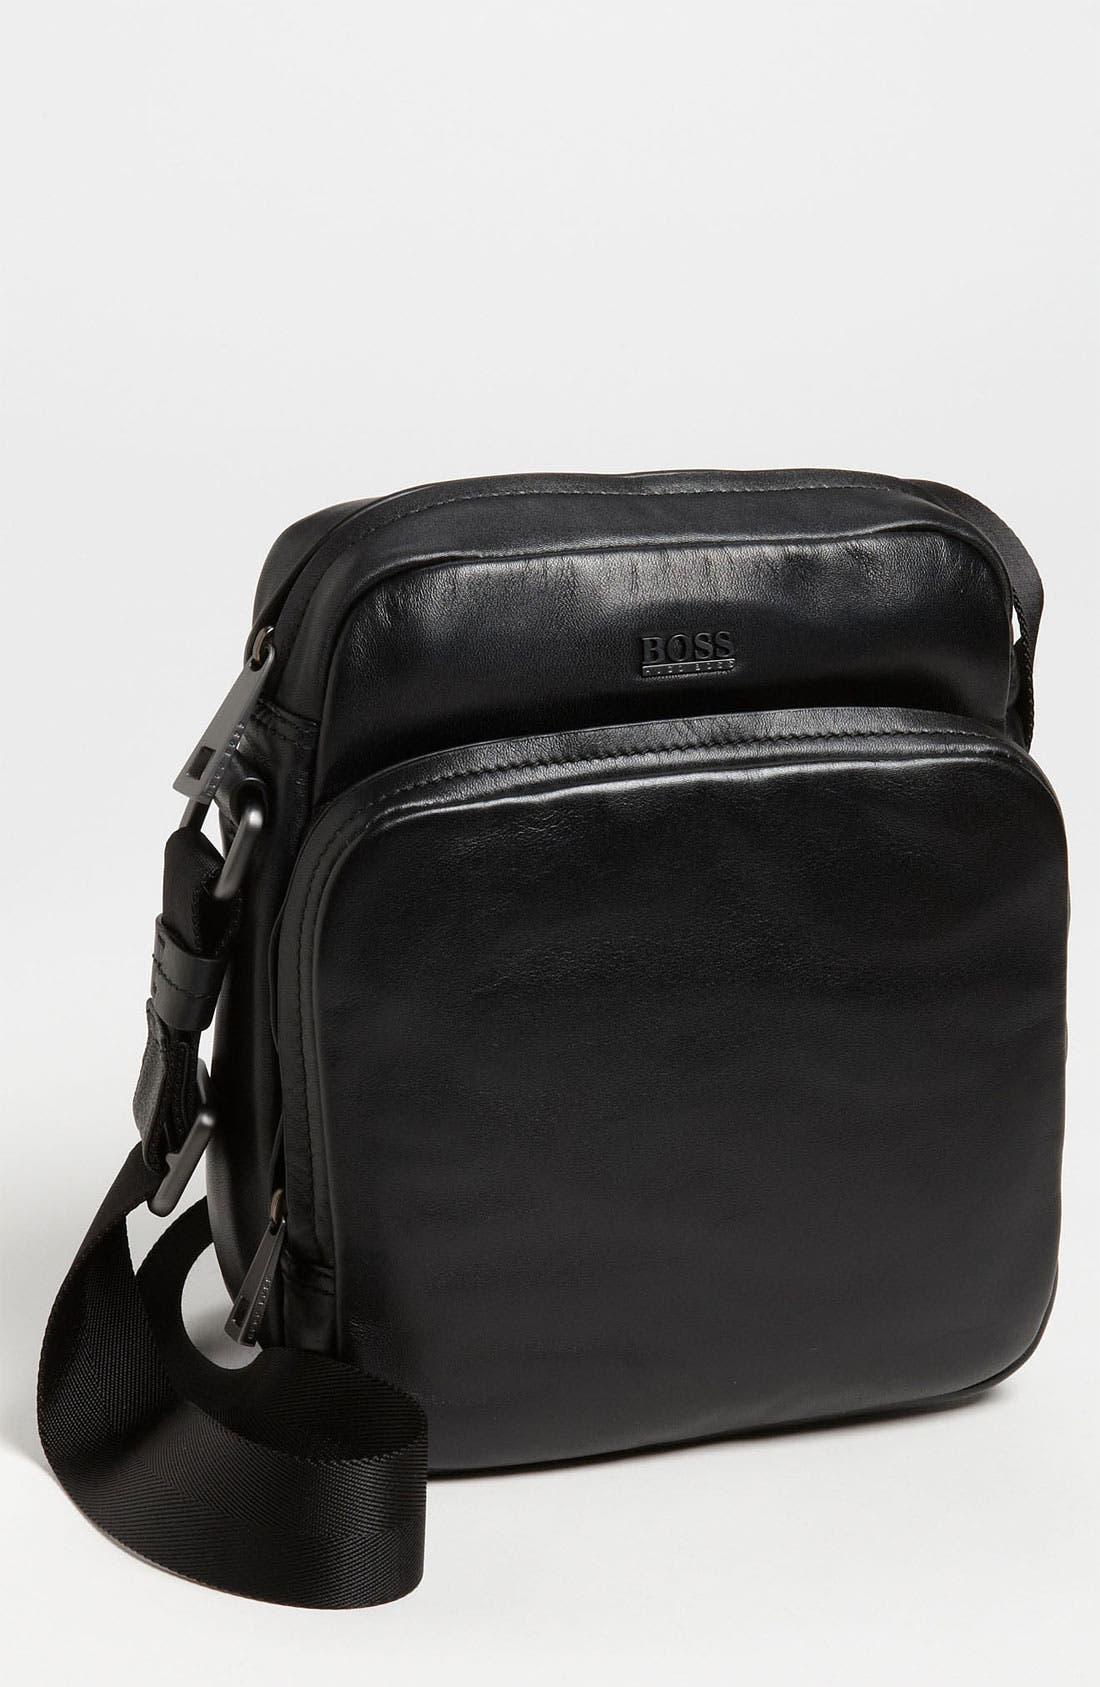 Alternate Image 1 Selected - BOSS Black 'Kunsty' Messenger Bag